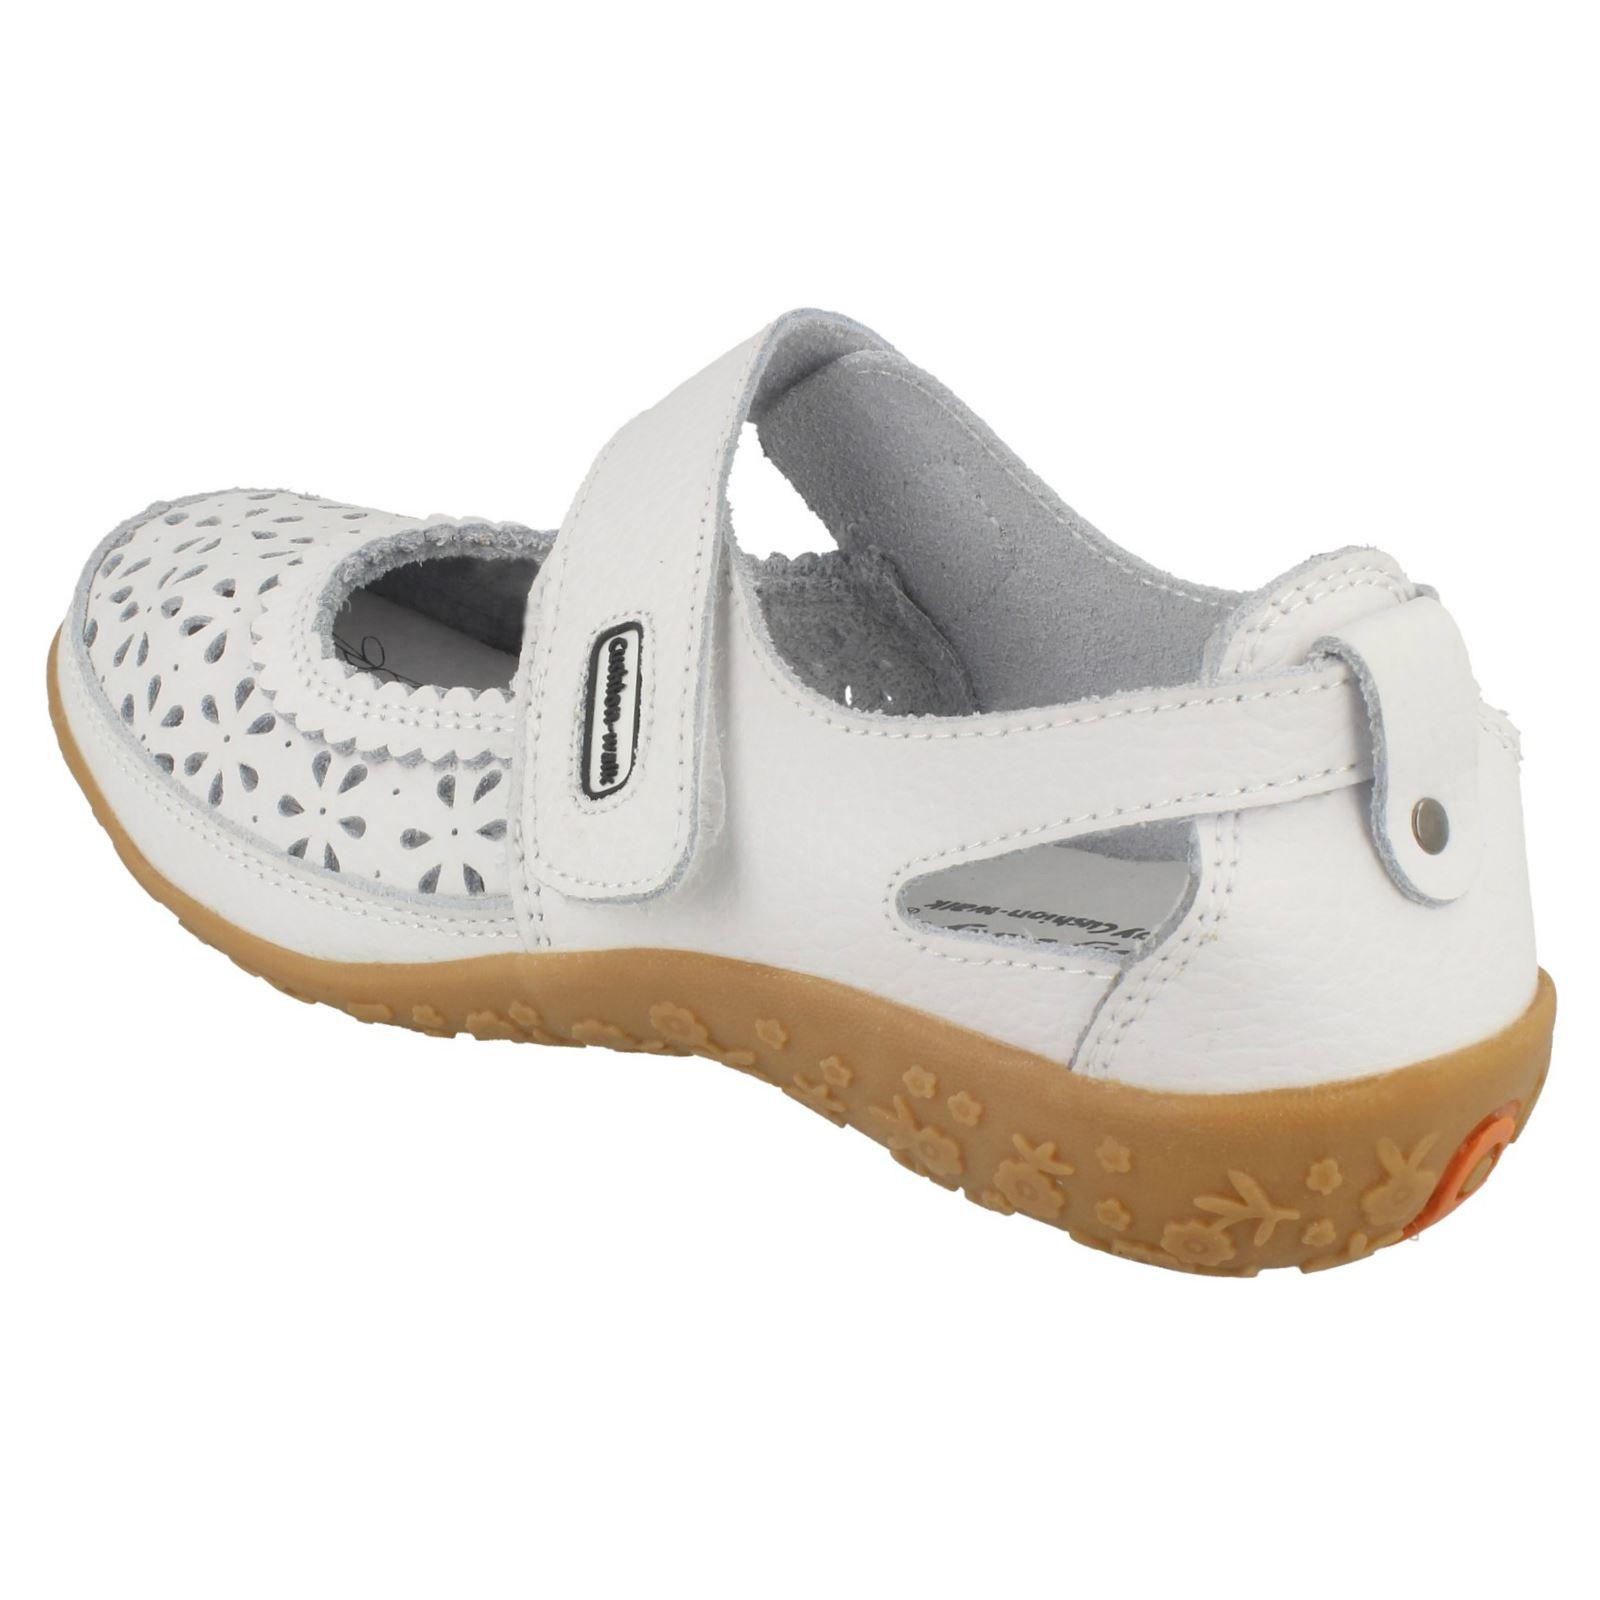 lifestyle by cushion walk casual shoes burnley ebay